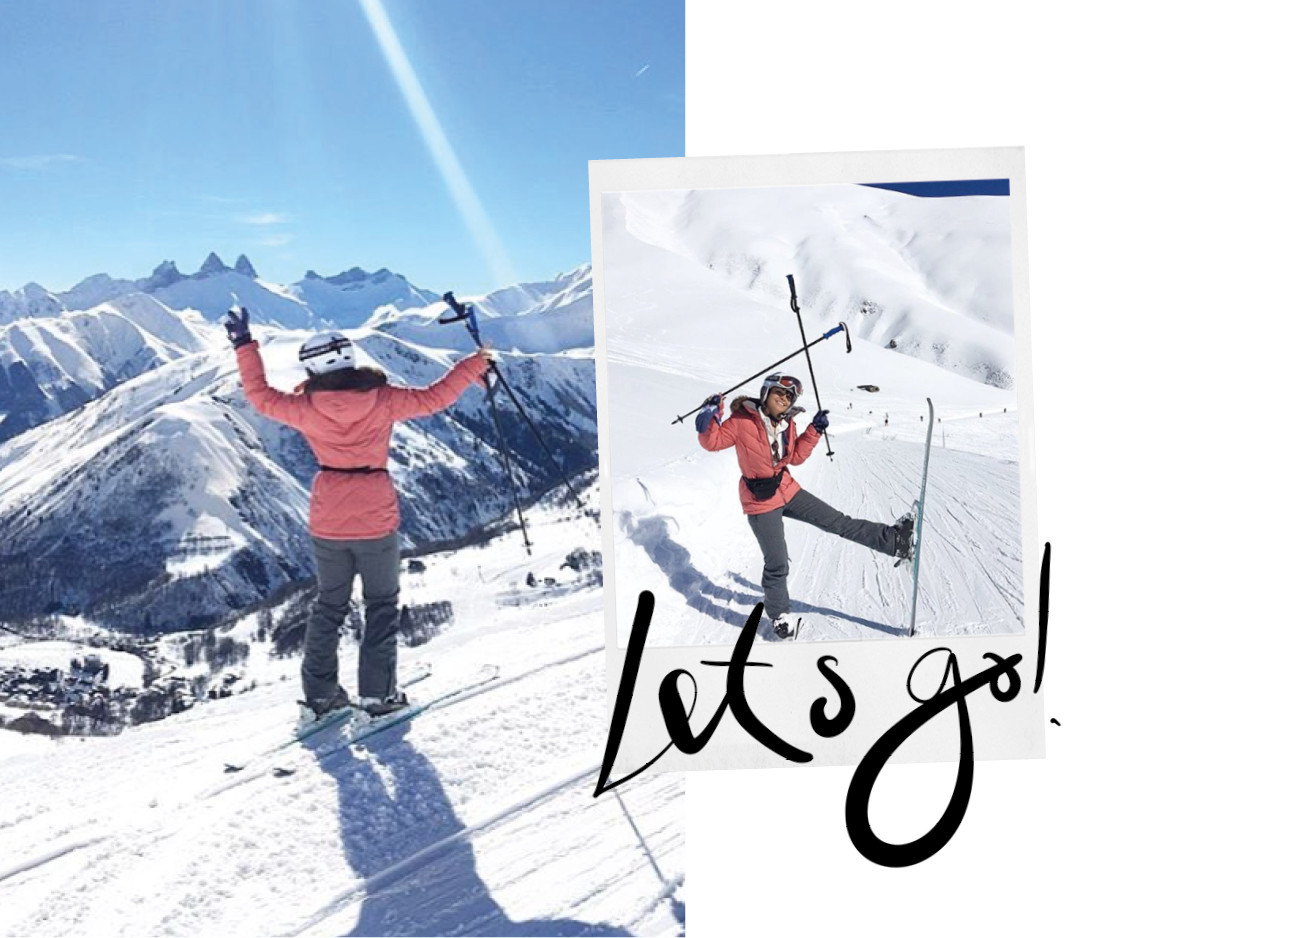 Kiki die in een roze skie jas op de berg staat